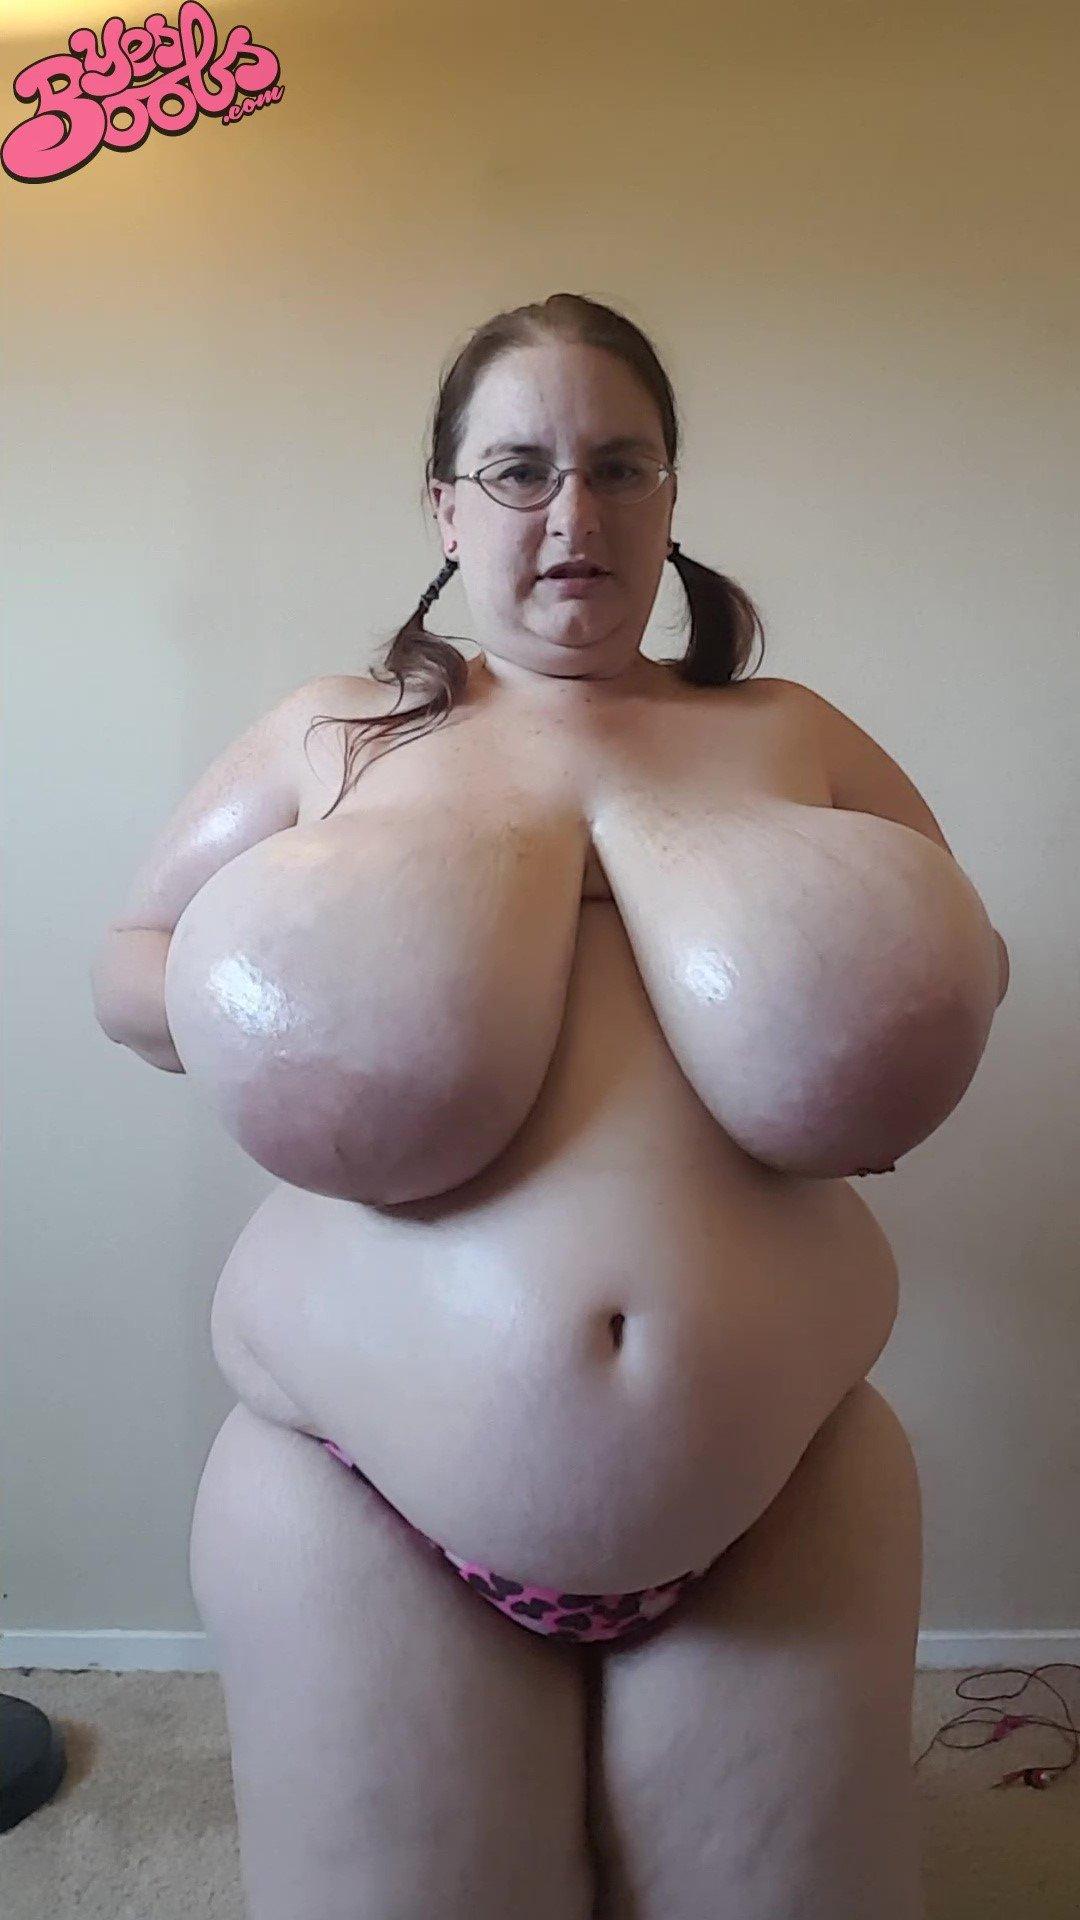 How big is lil fizz dick